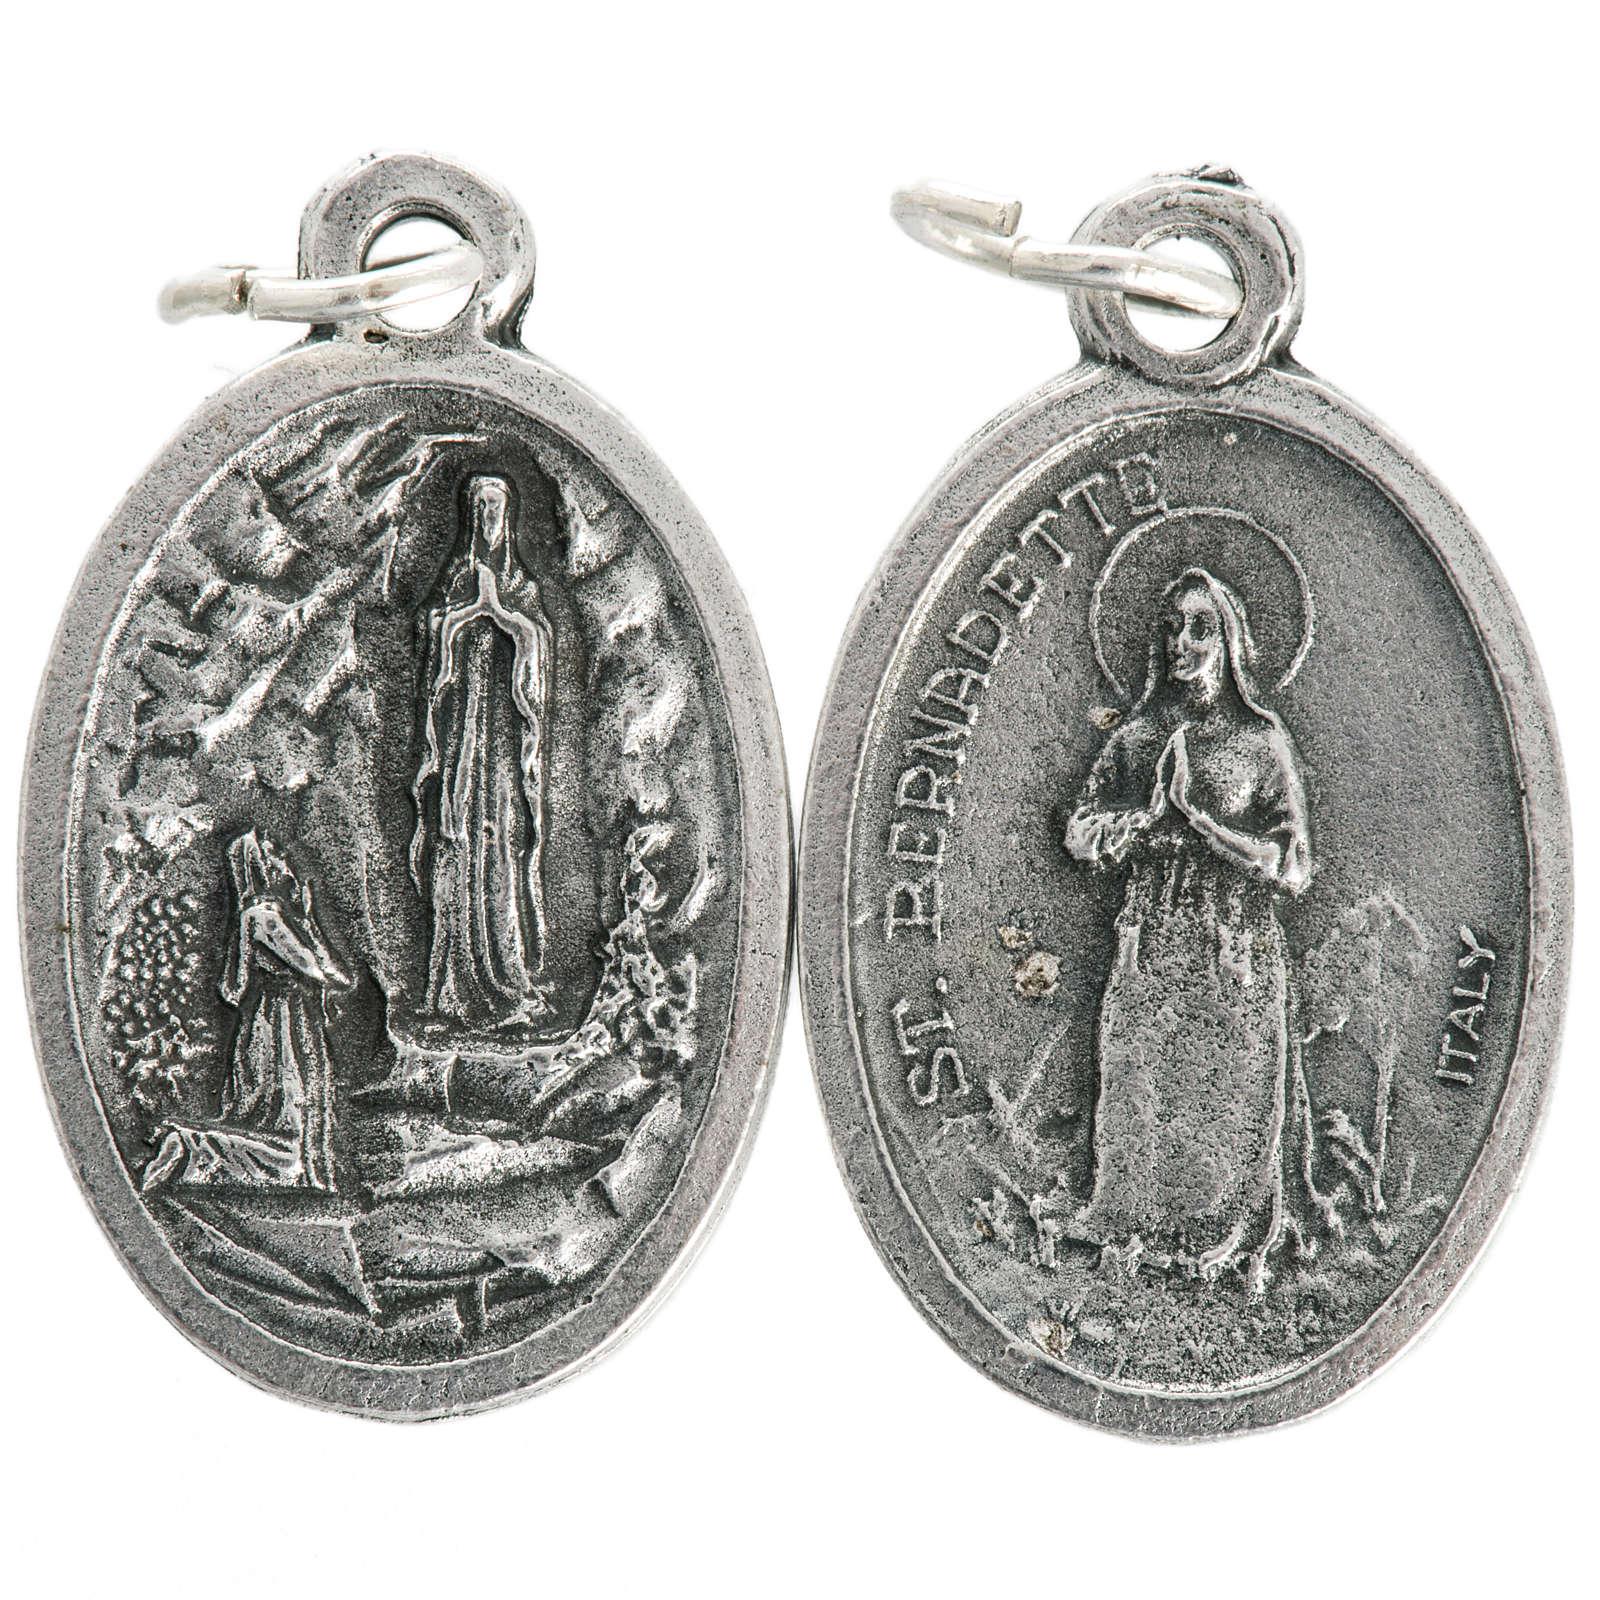 Medaglia Madonna Lourdes ovale metallo ossidato 20 mm 4